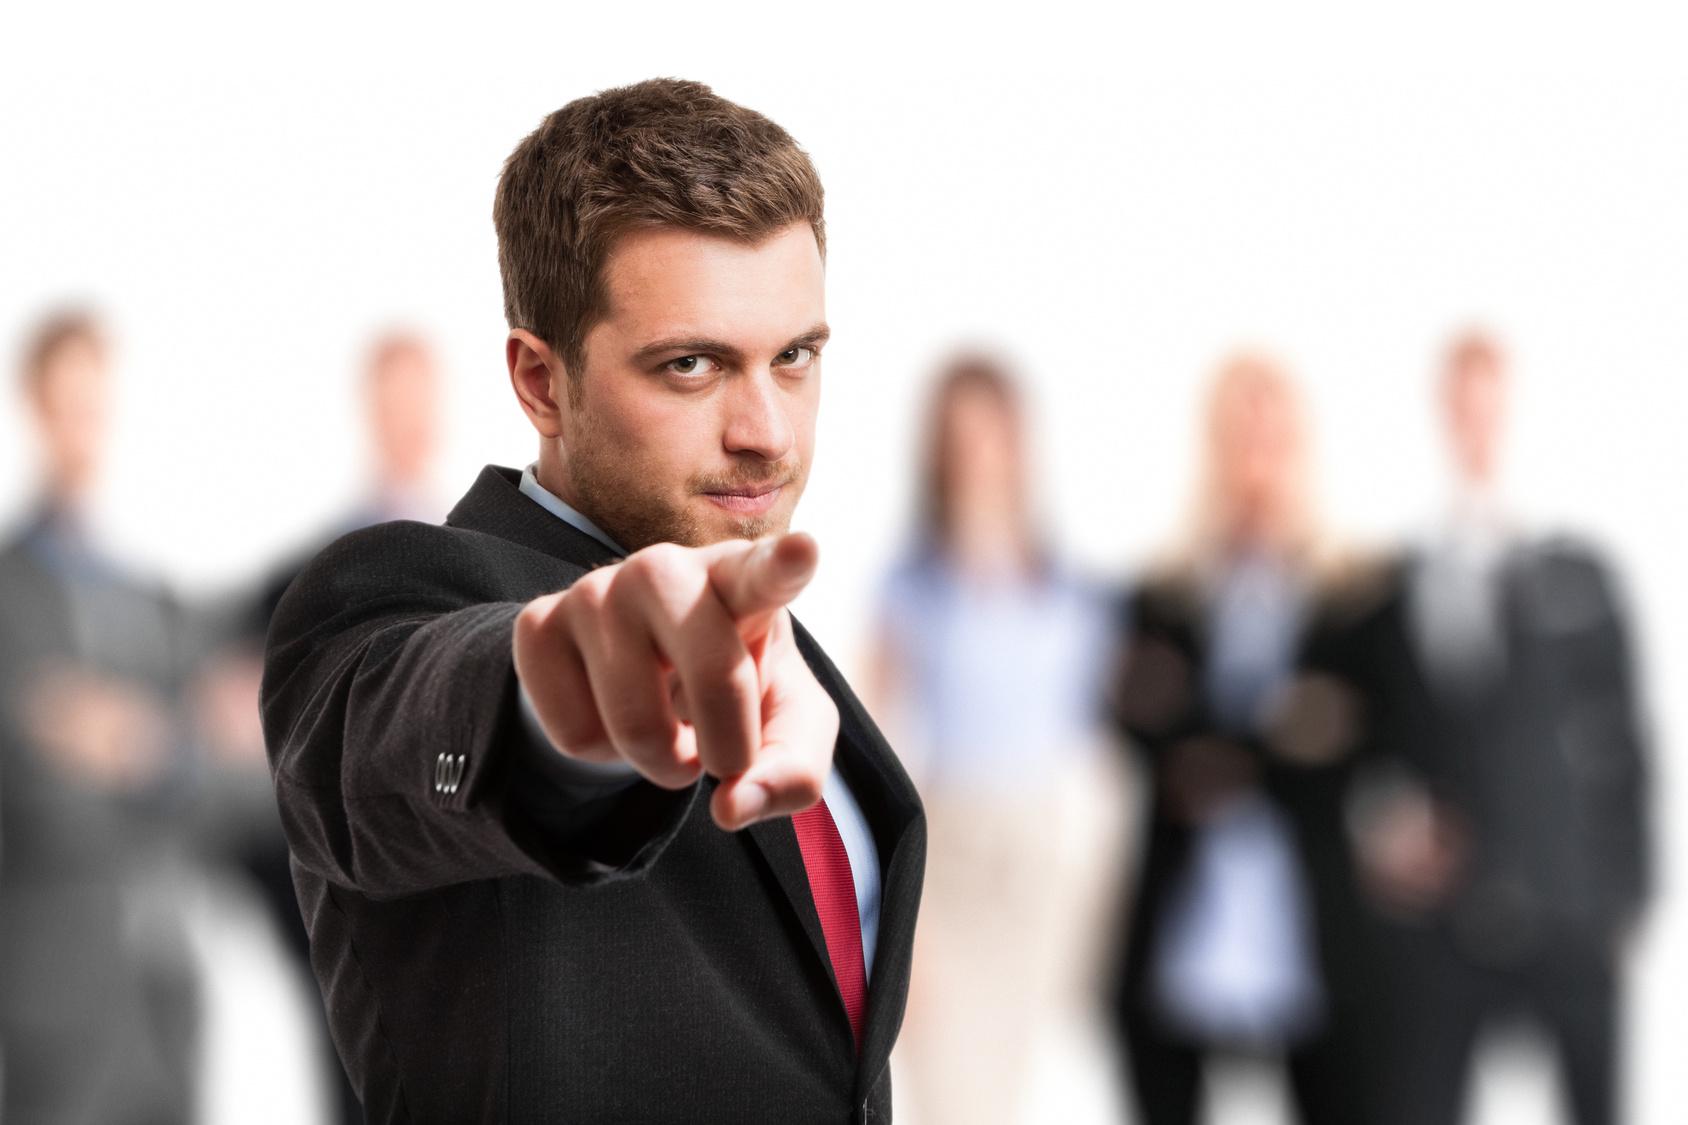 businessman-you-finger-Fotolia_45070816_Subscription_Monthly_M